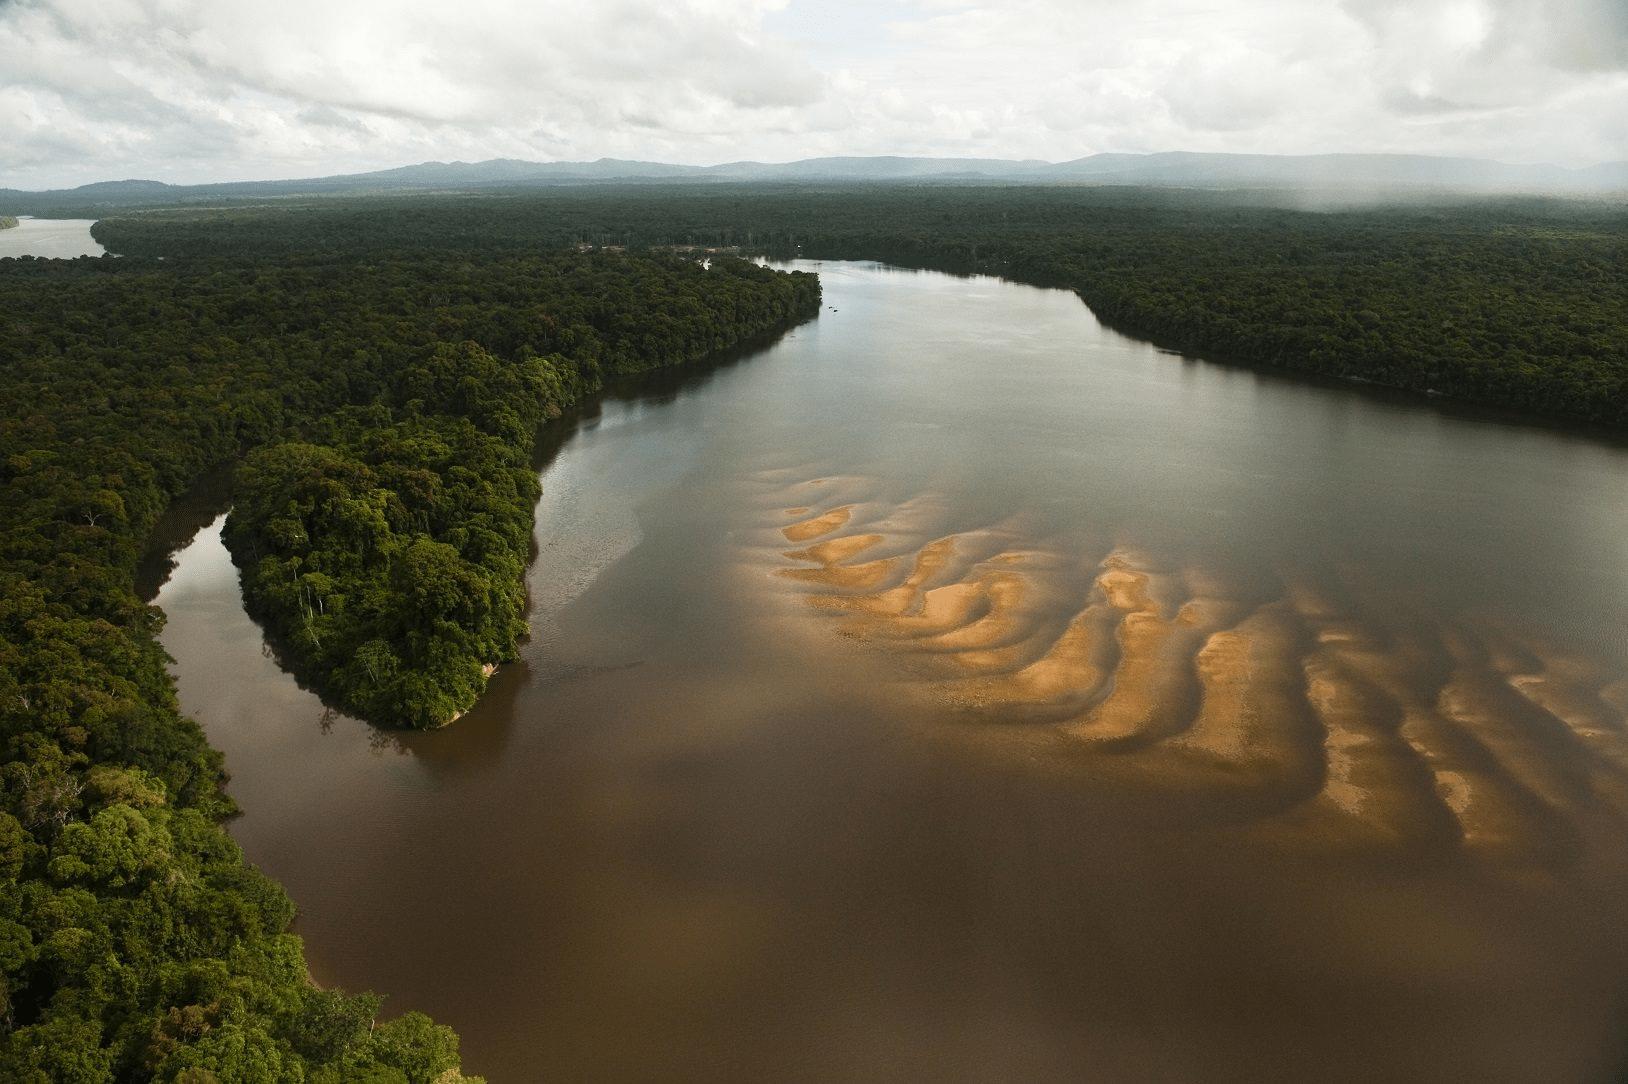 Río Esequibo. Disputa